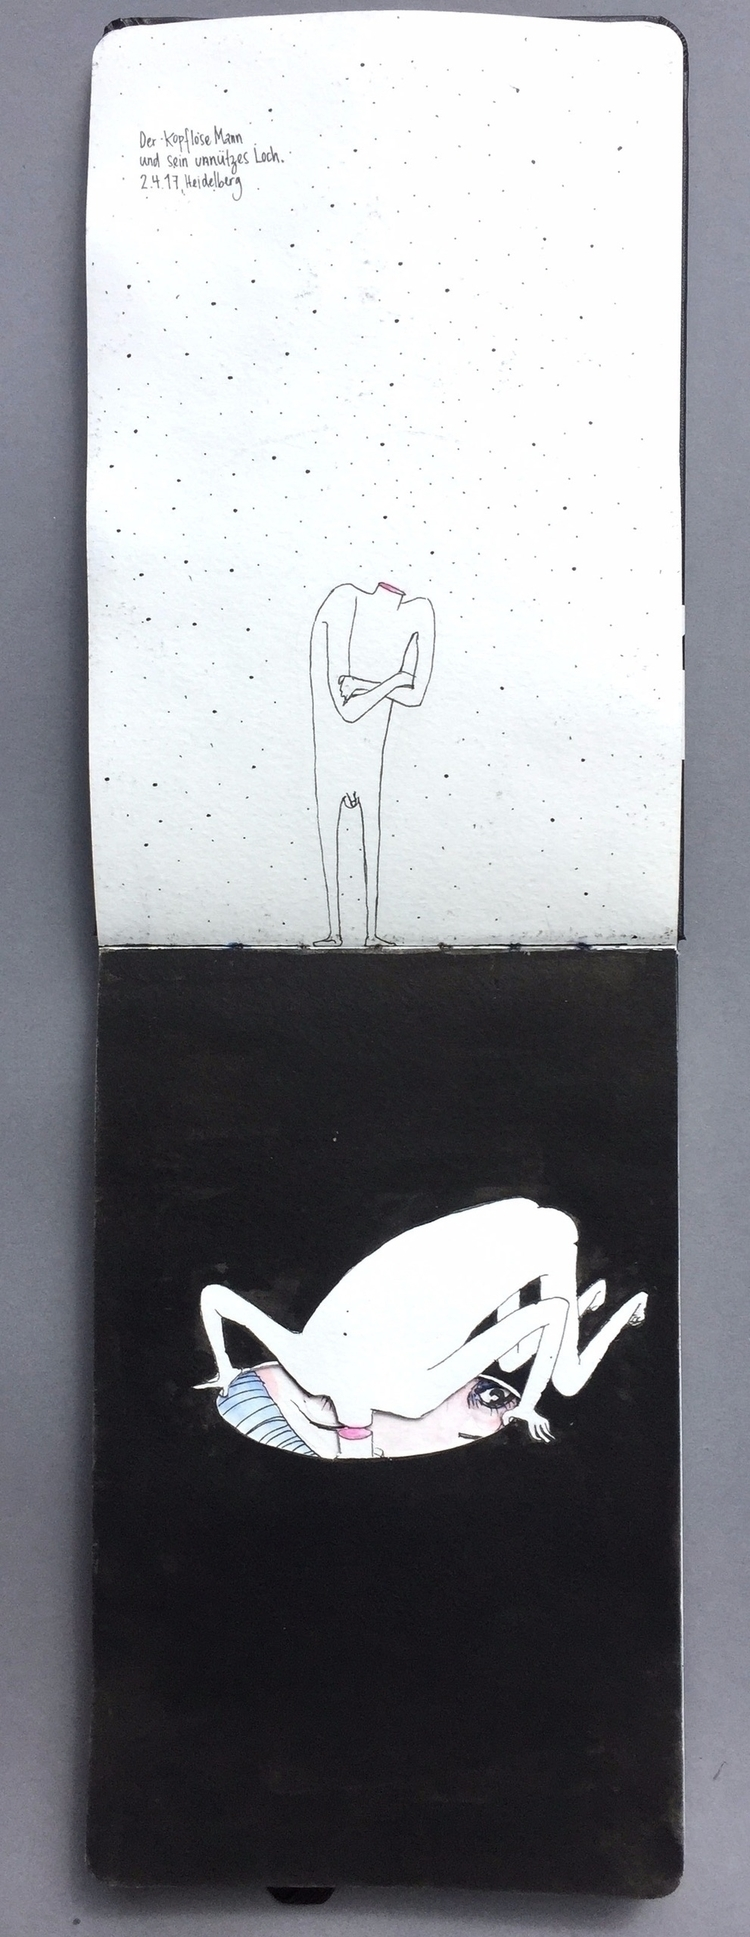 headless men - illustration, drawing - violakonrad | ello